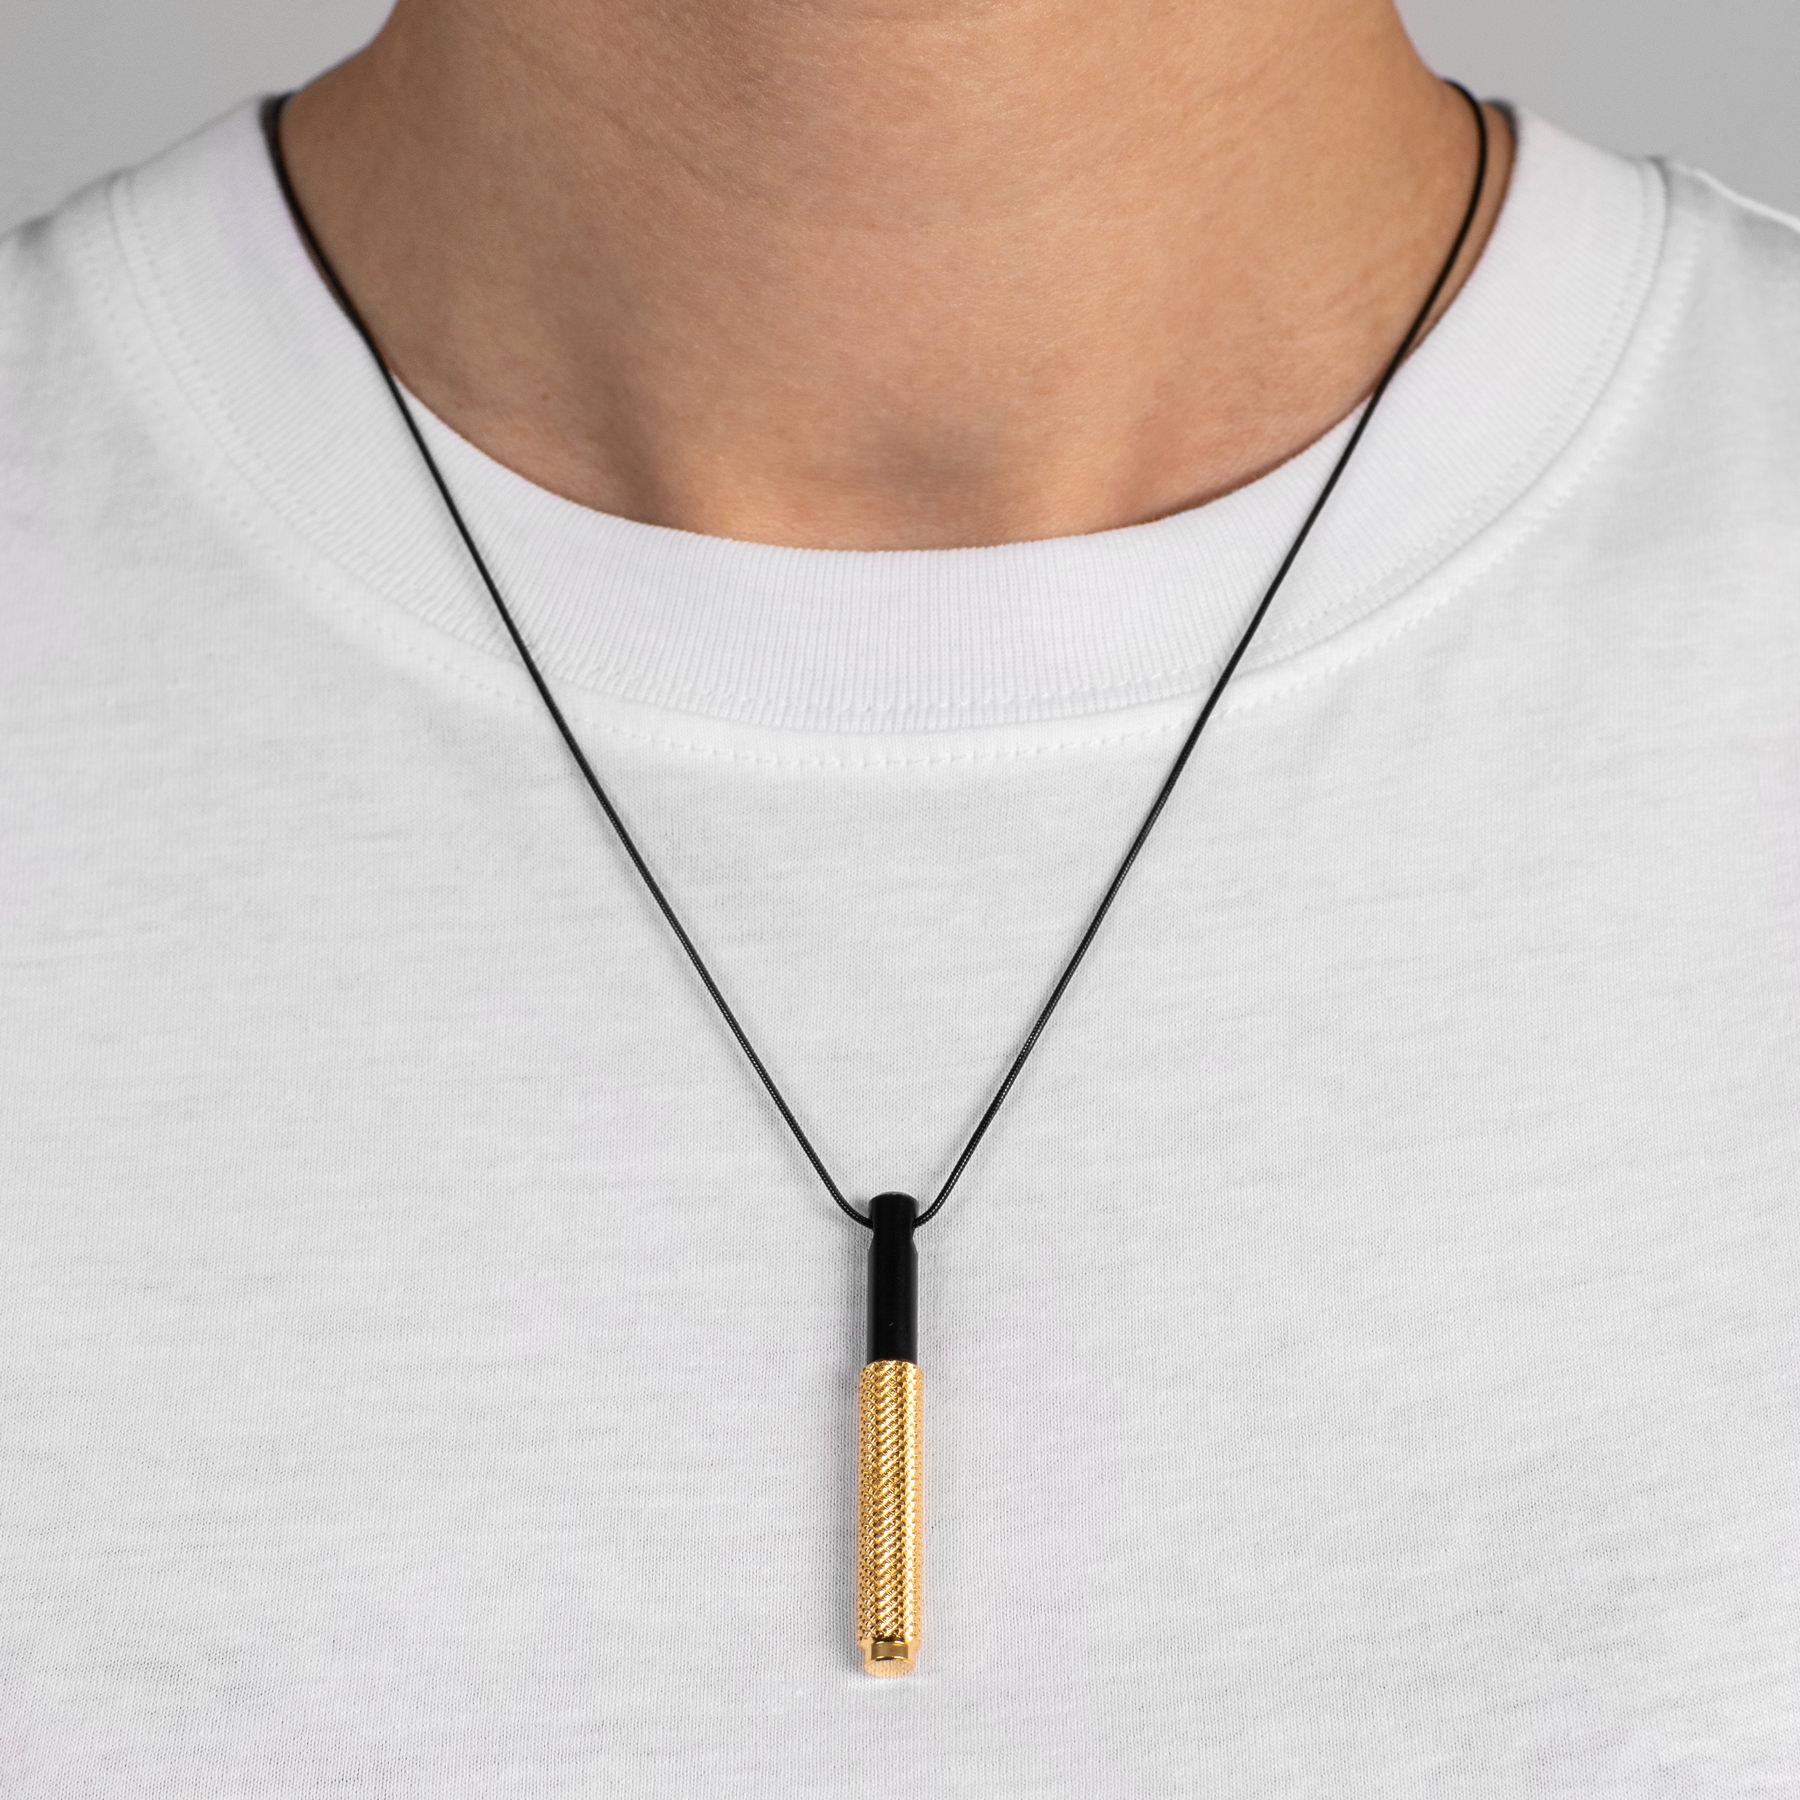 necklace_black_chain_gold_pendant